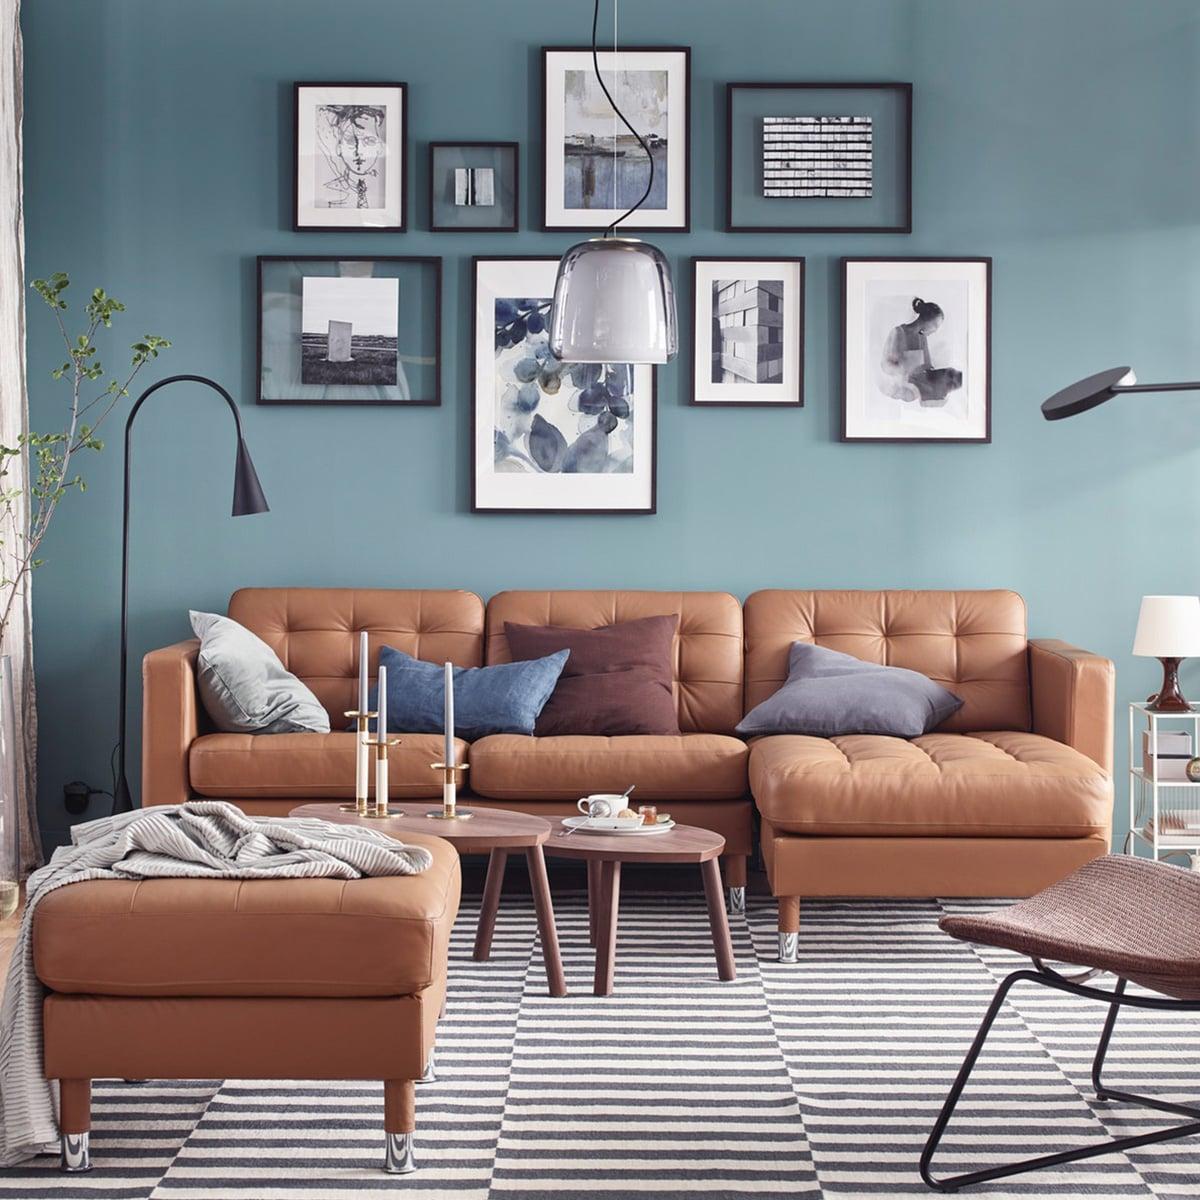 Inspiration mobilier de séjour